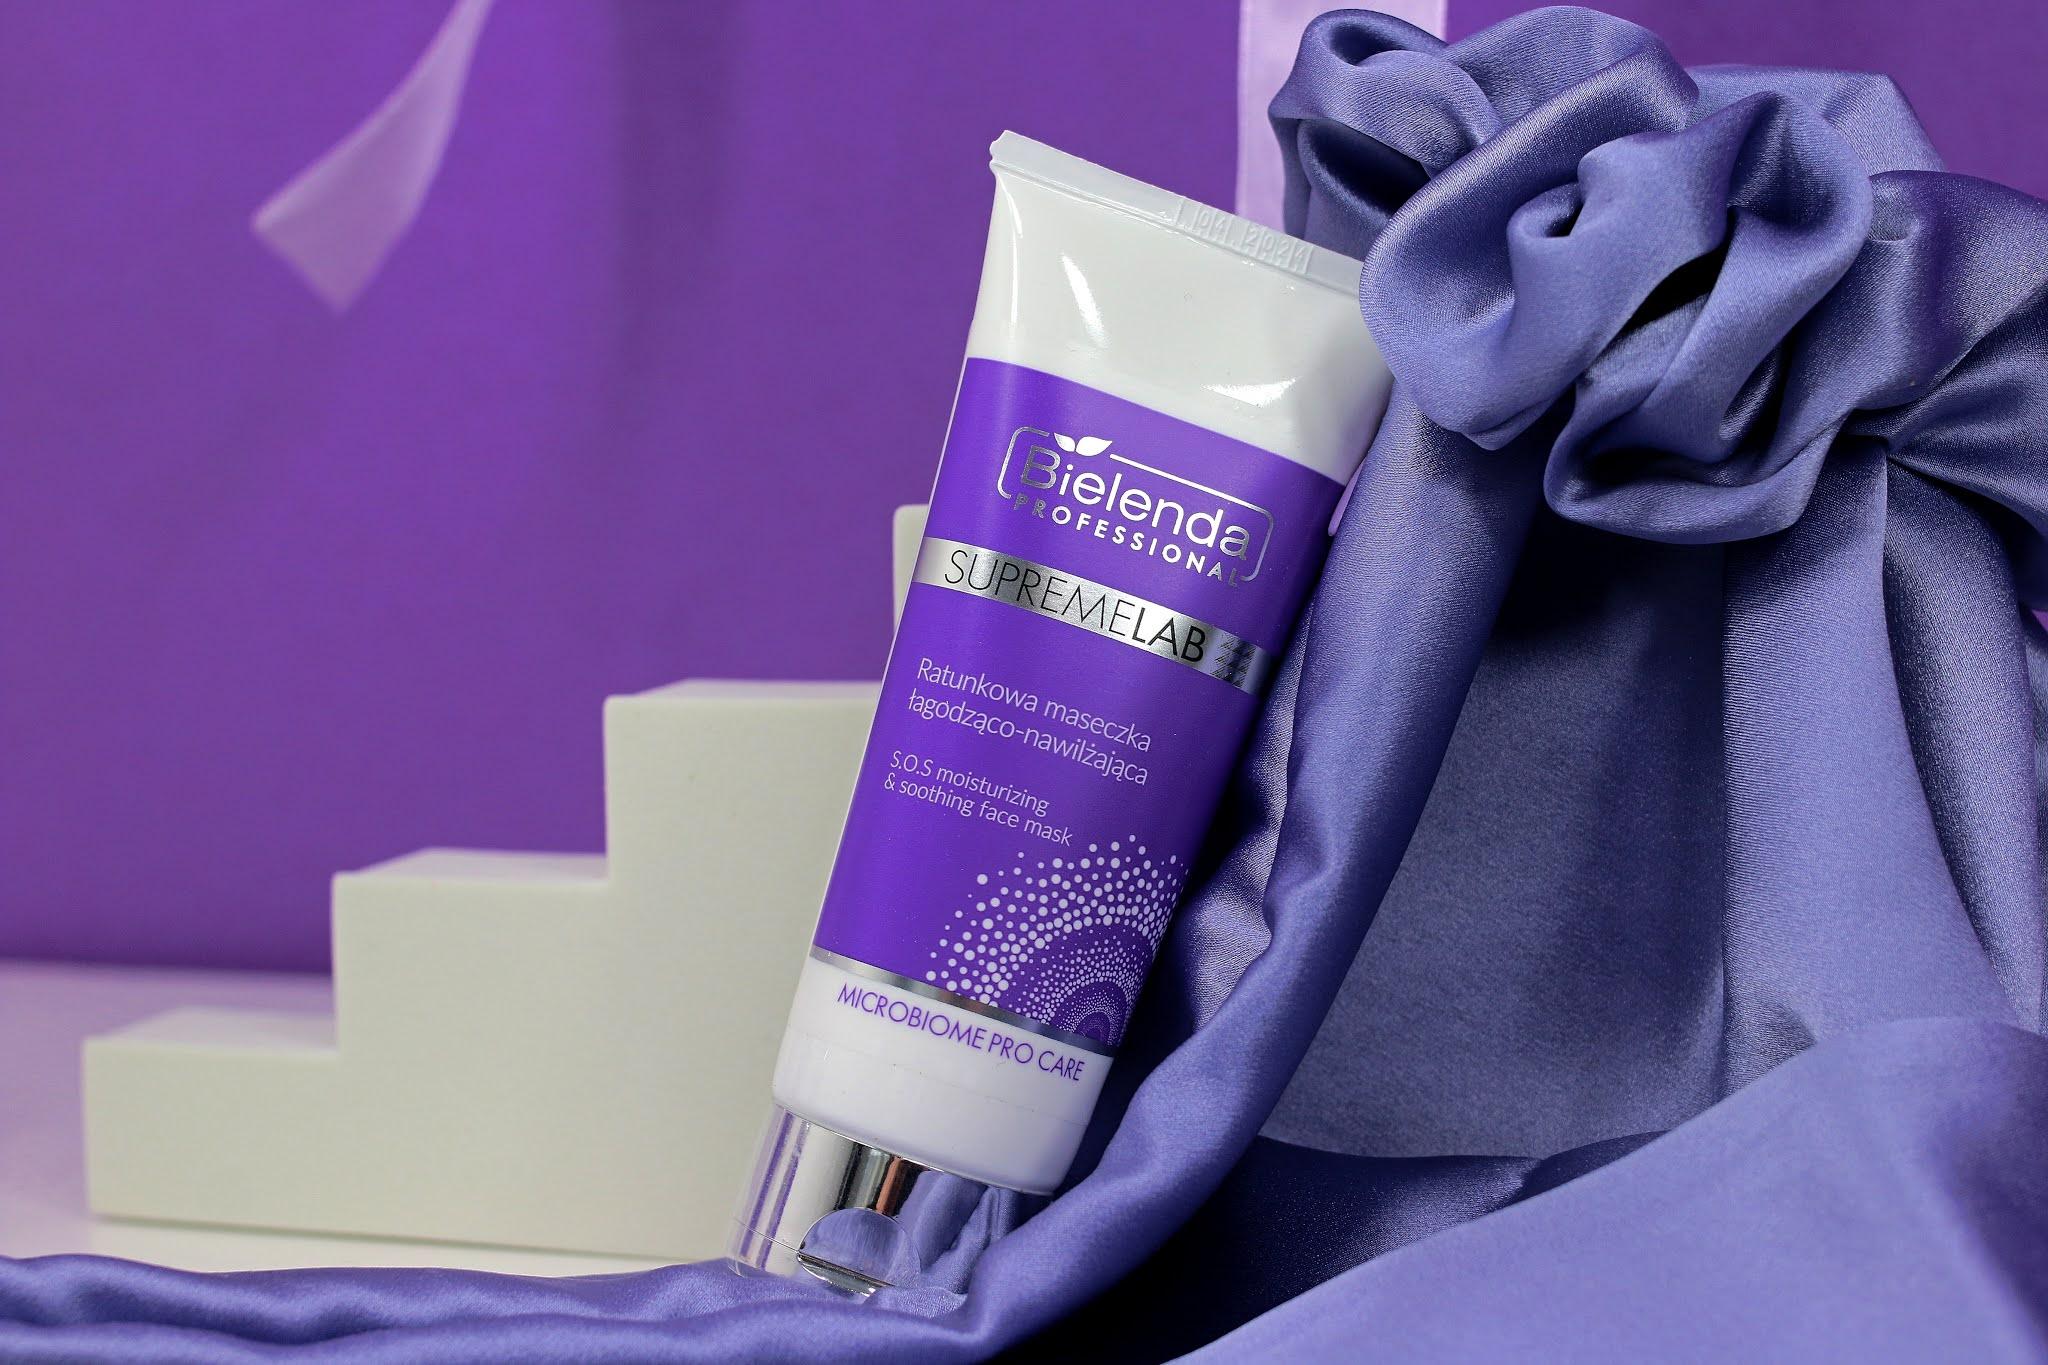 Bielenda SupremeLab Microbiome Pro Care Maska